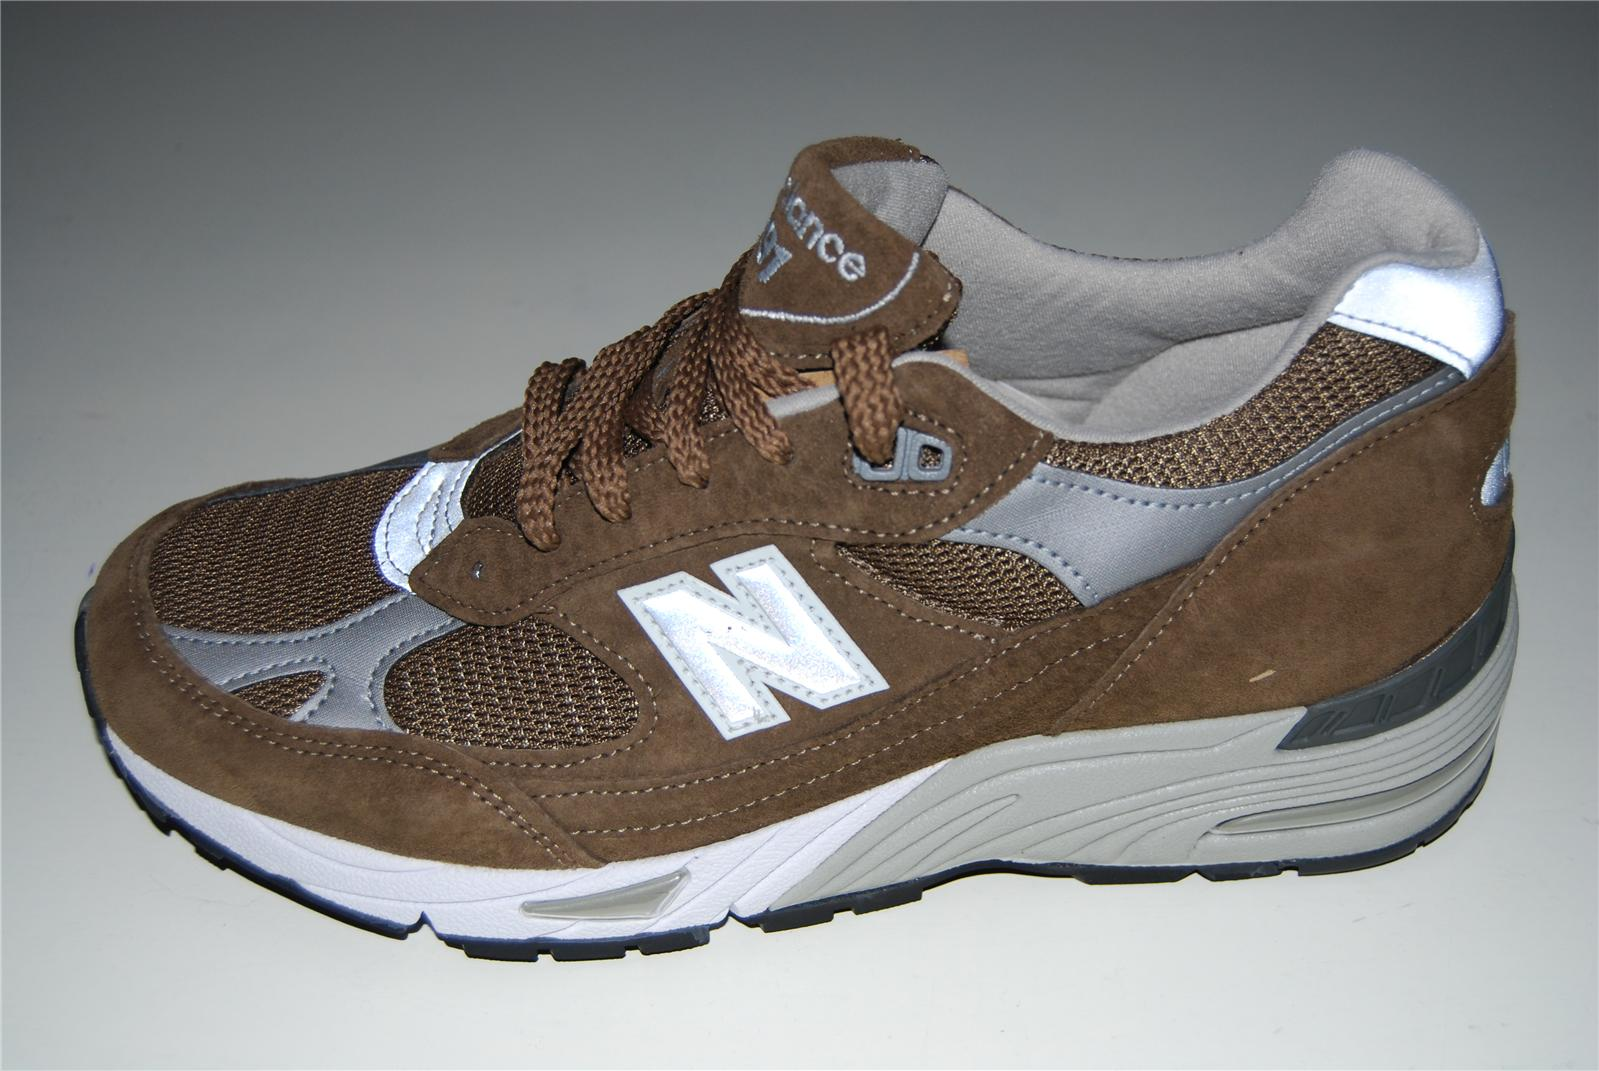 scarpe new balance 991 offerte